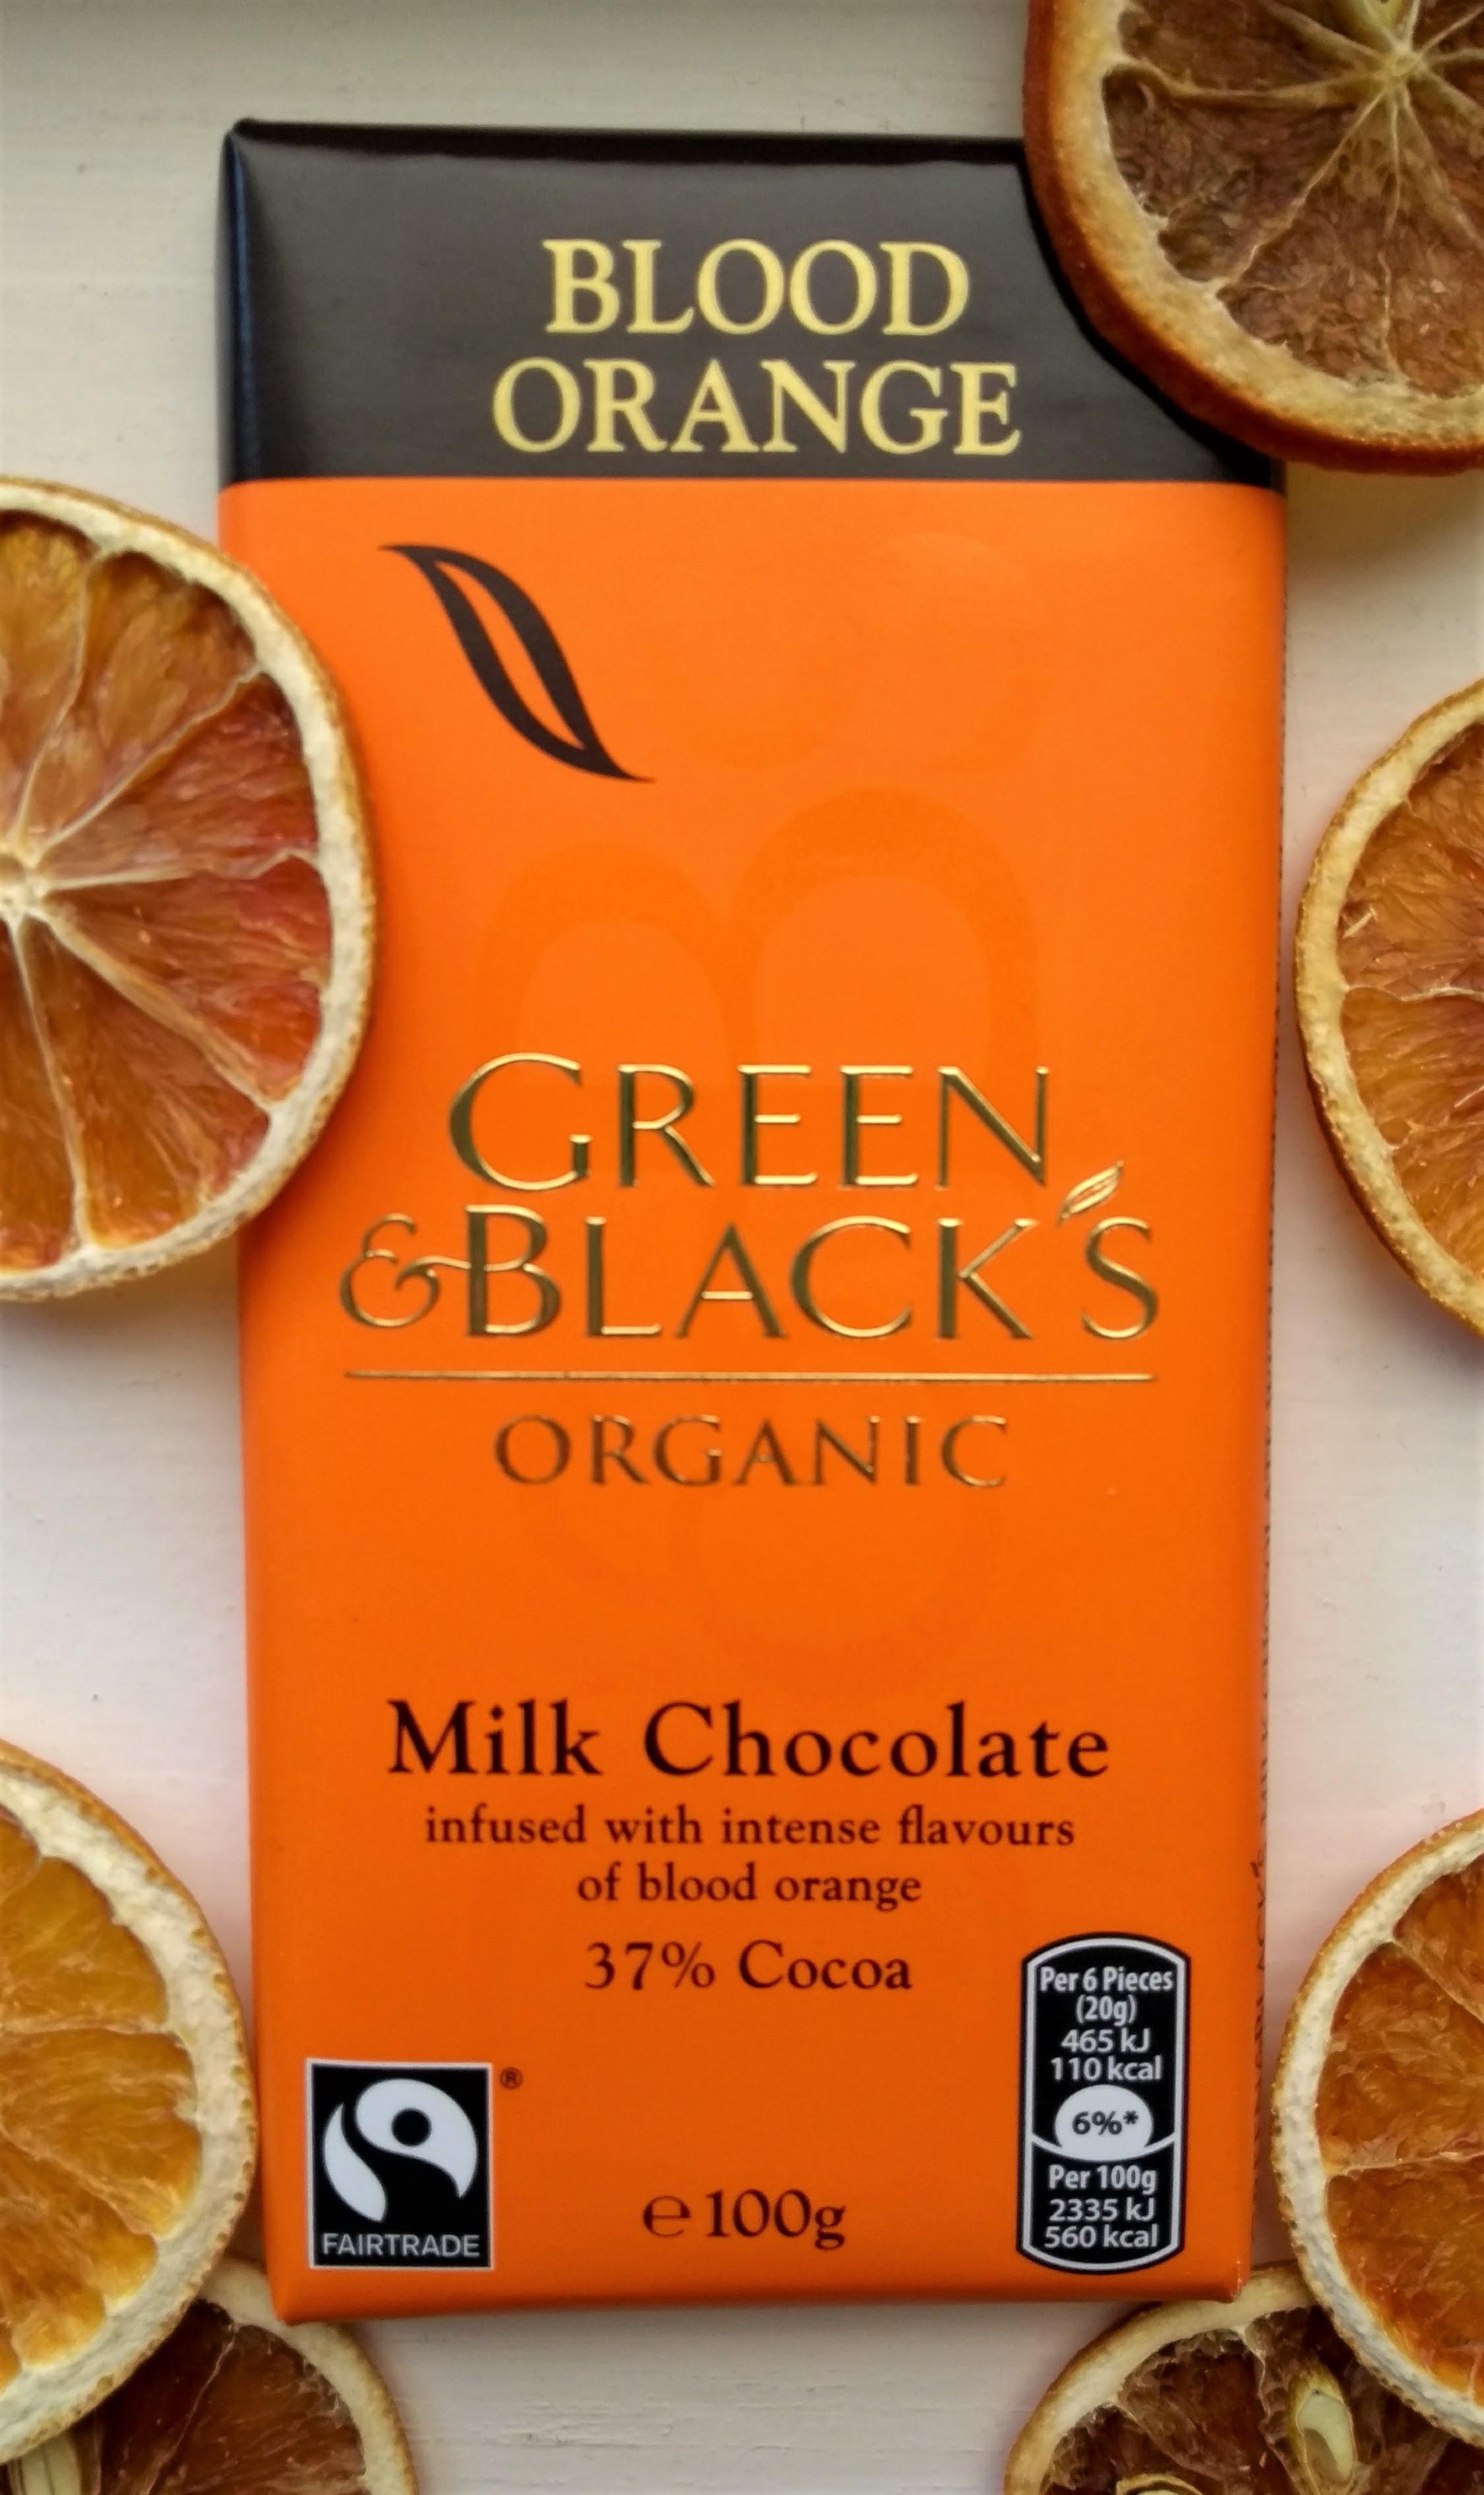 Green & Black's Blood Orange